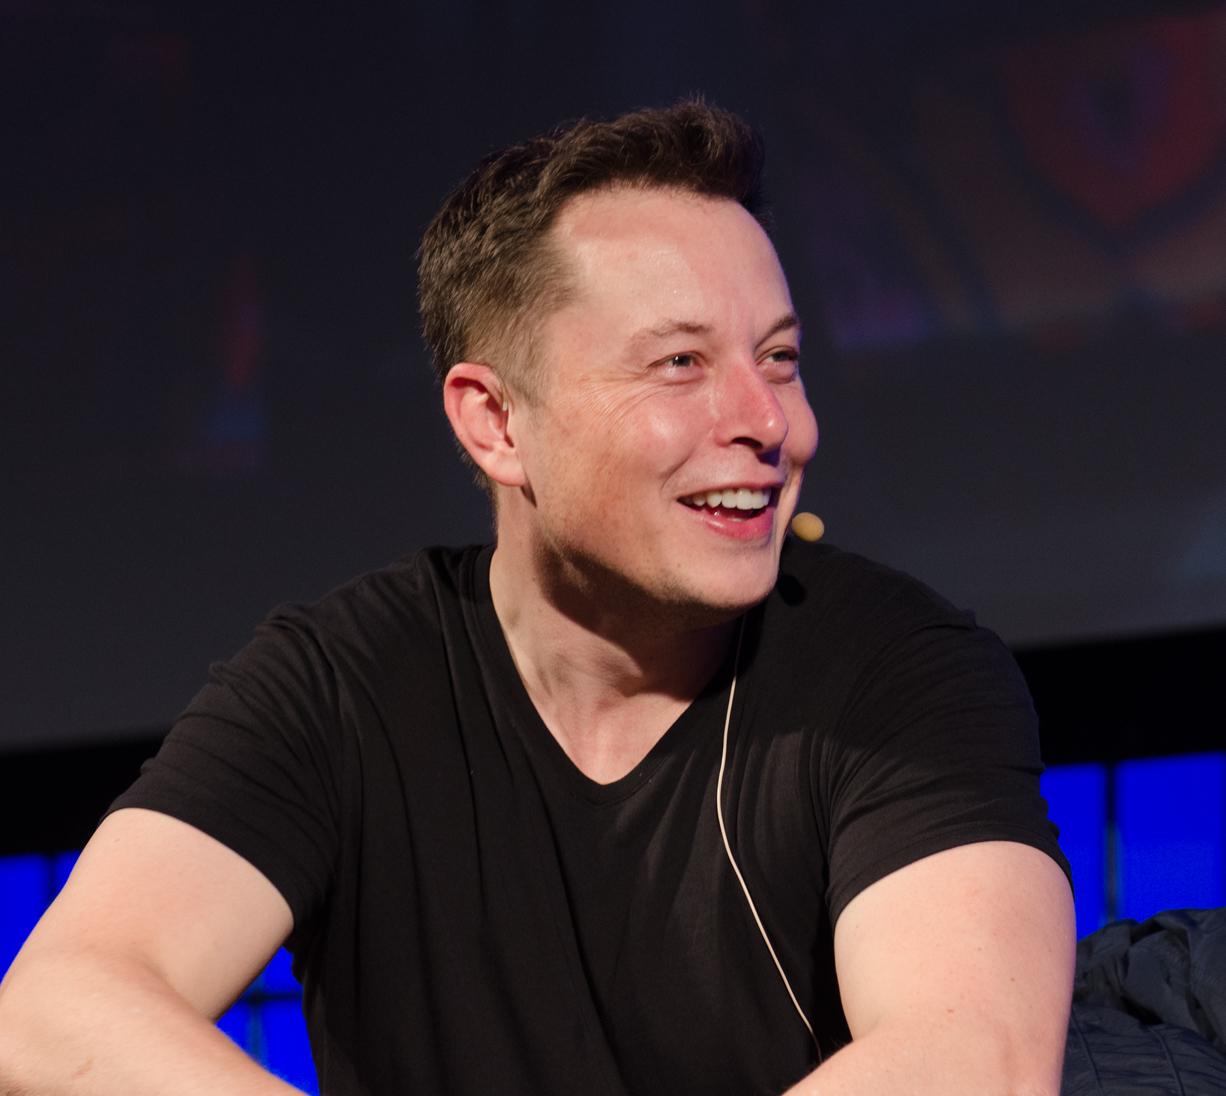 Binance CEO Waiting for Elon Musk to Take Bitcoin Lightning Torch